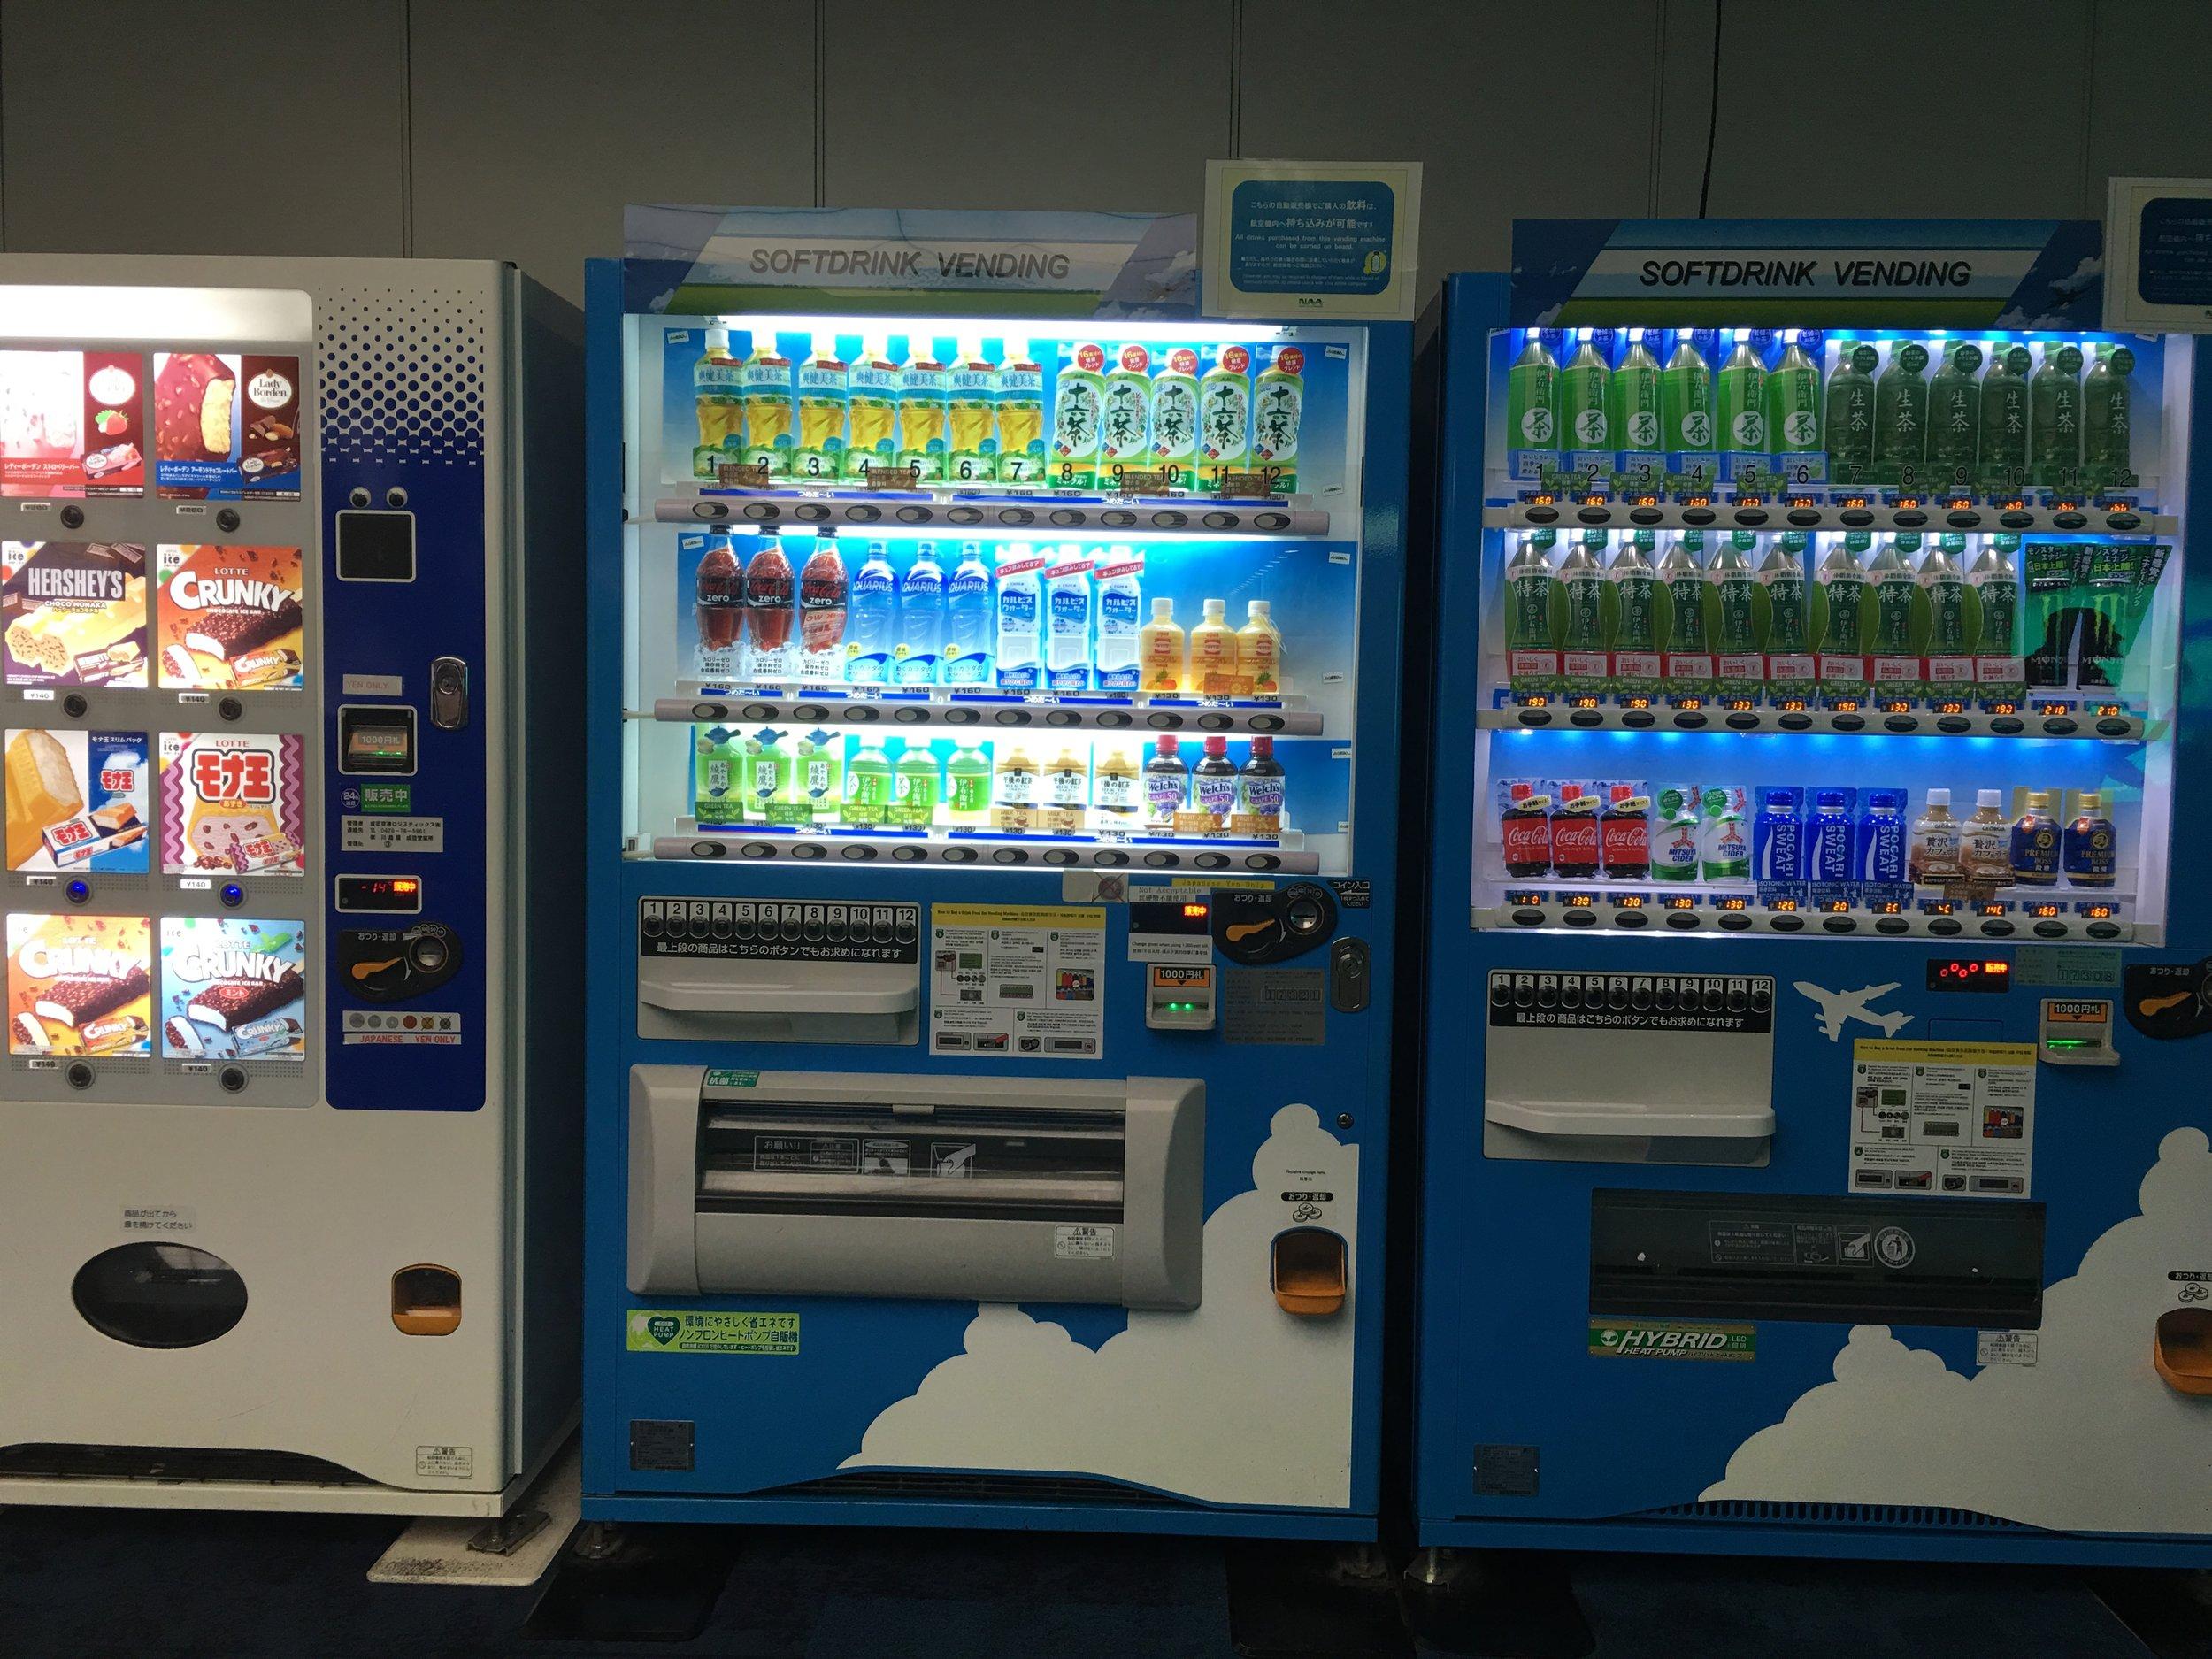 Vending machine goodness